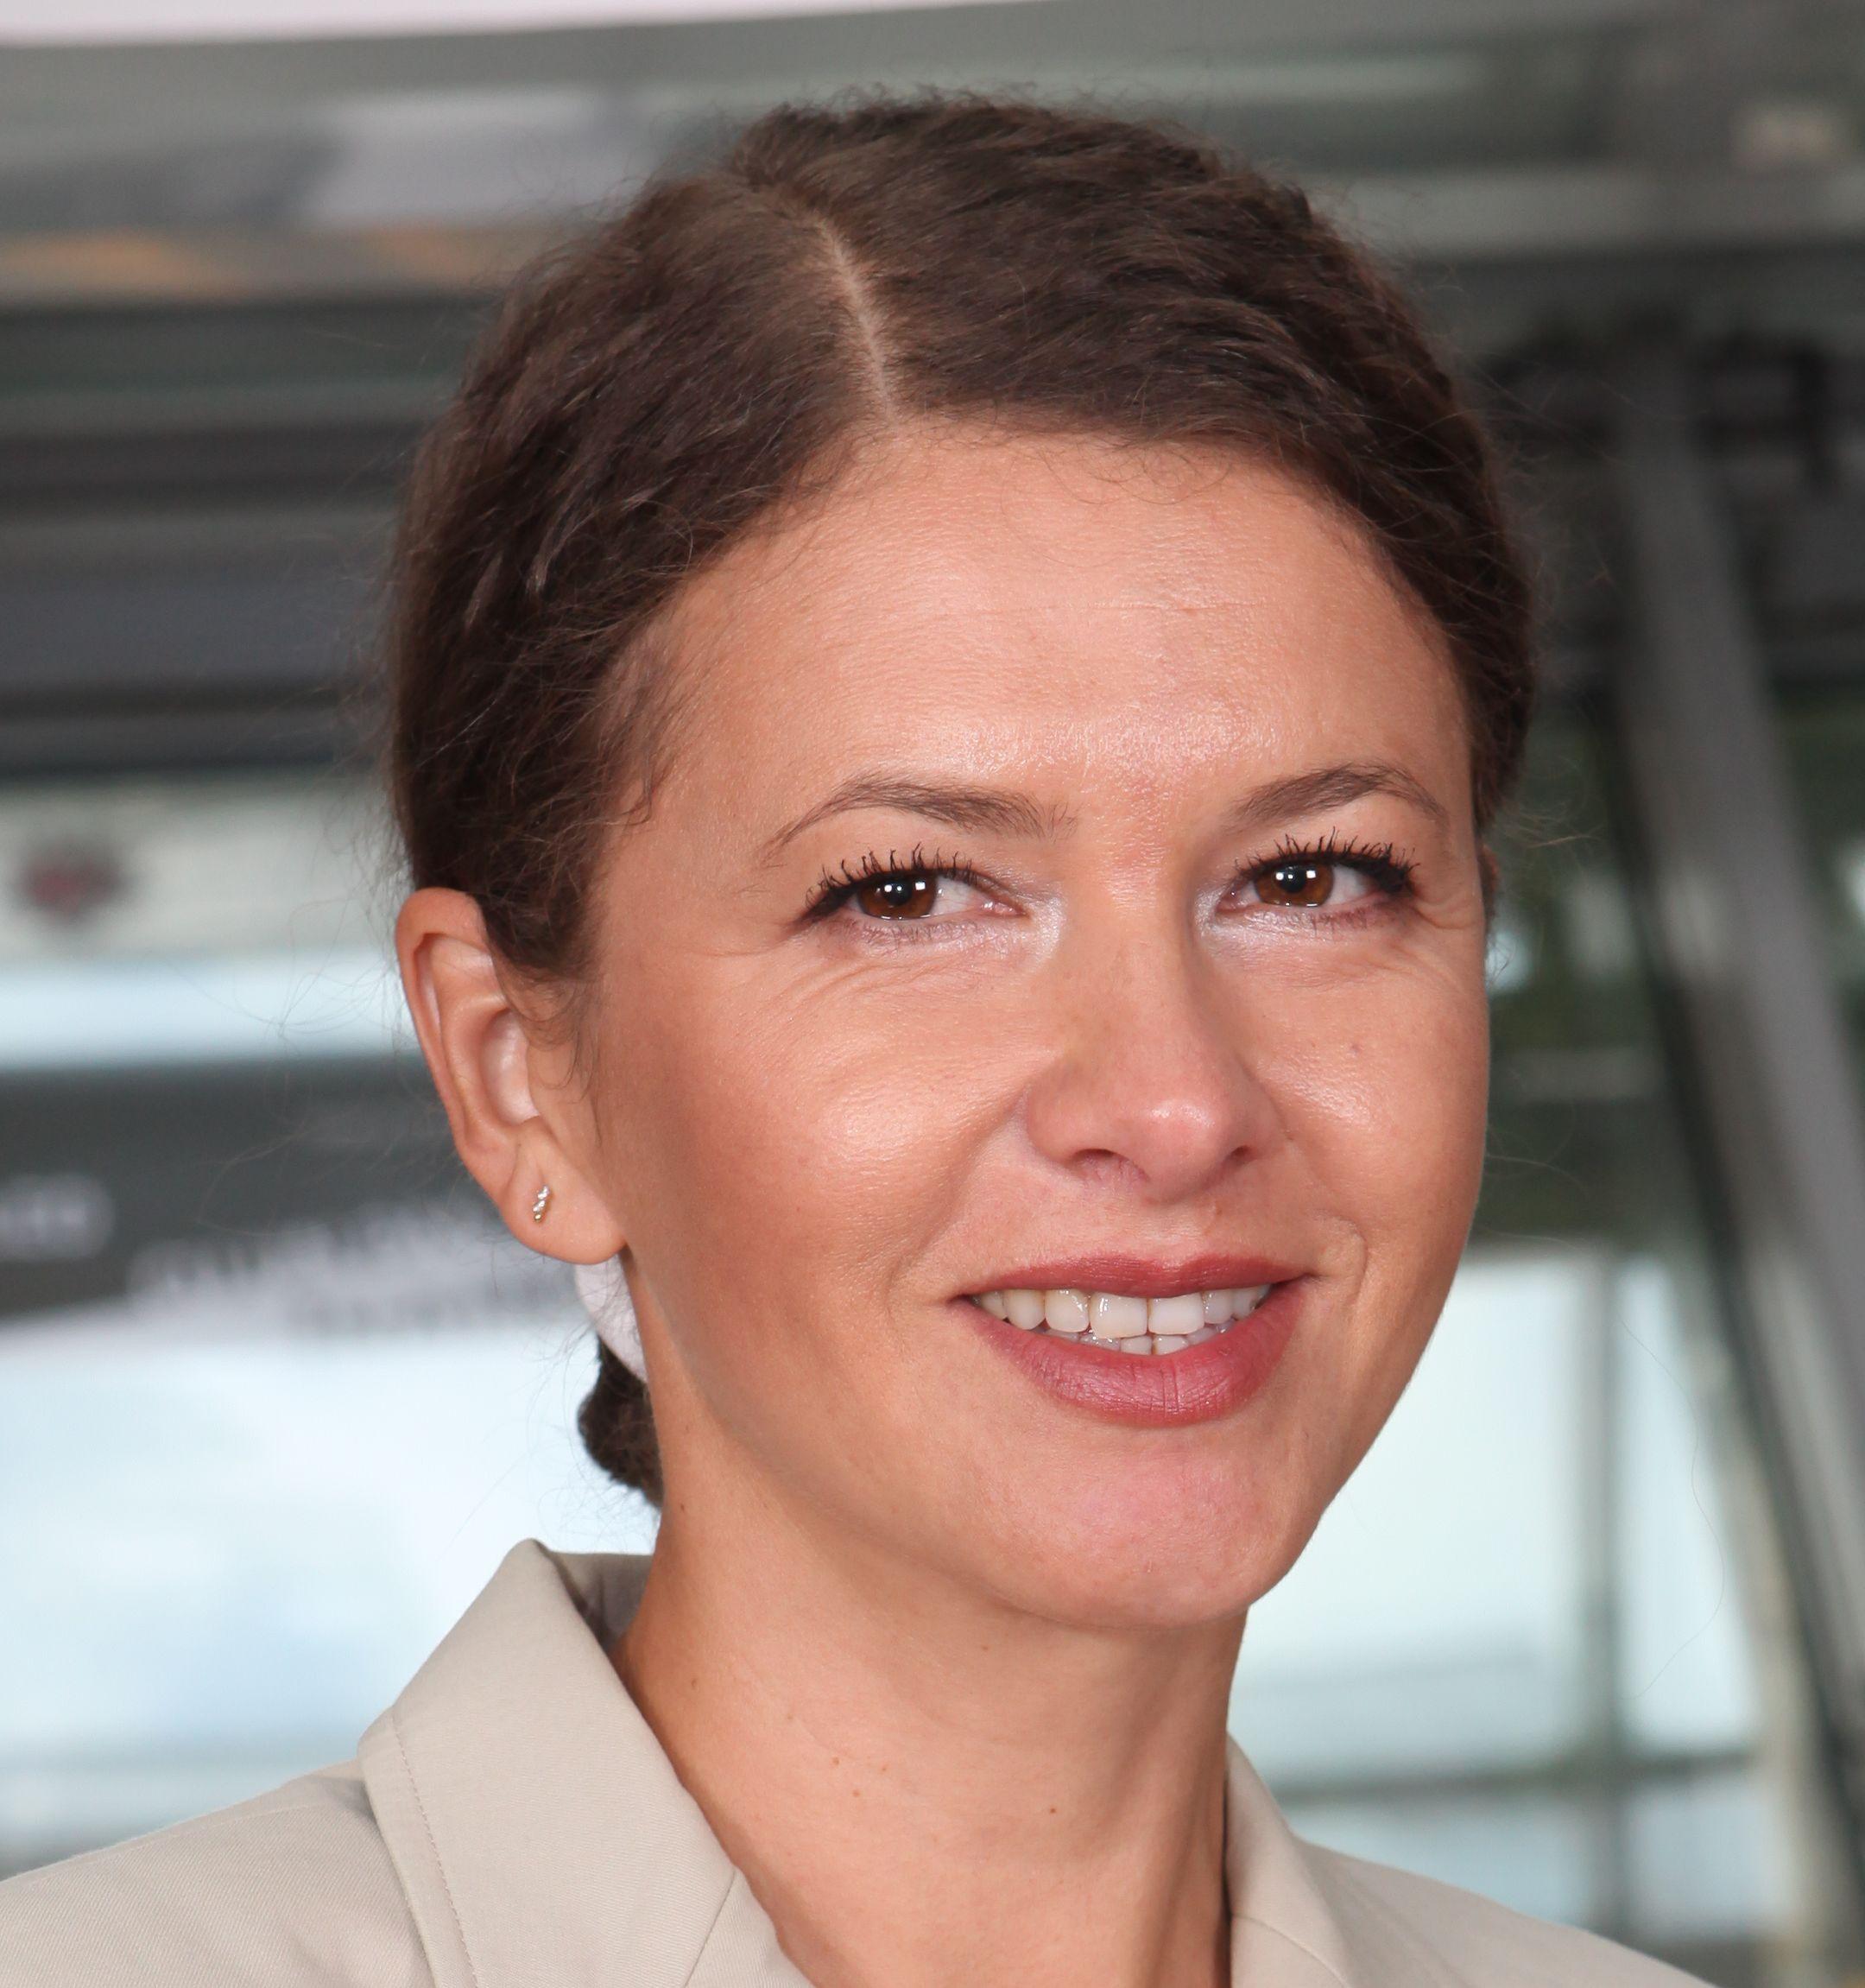 <p>Grațiela Măgdălinoiu</p>